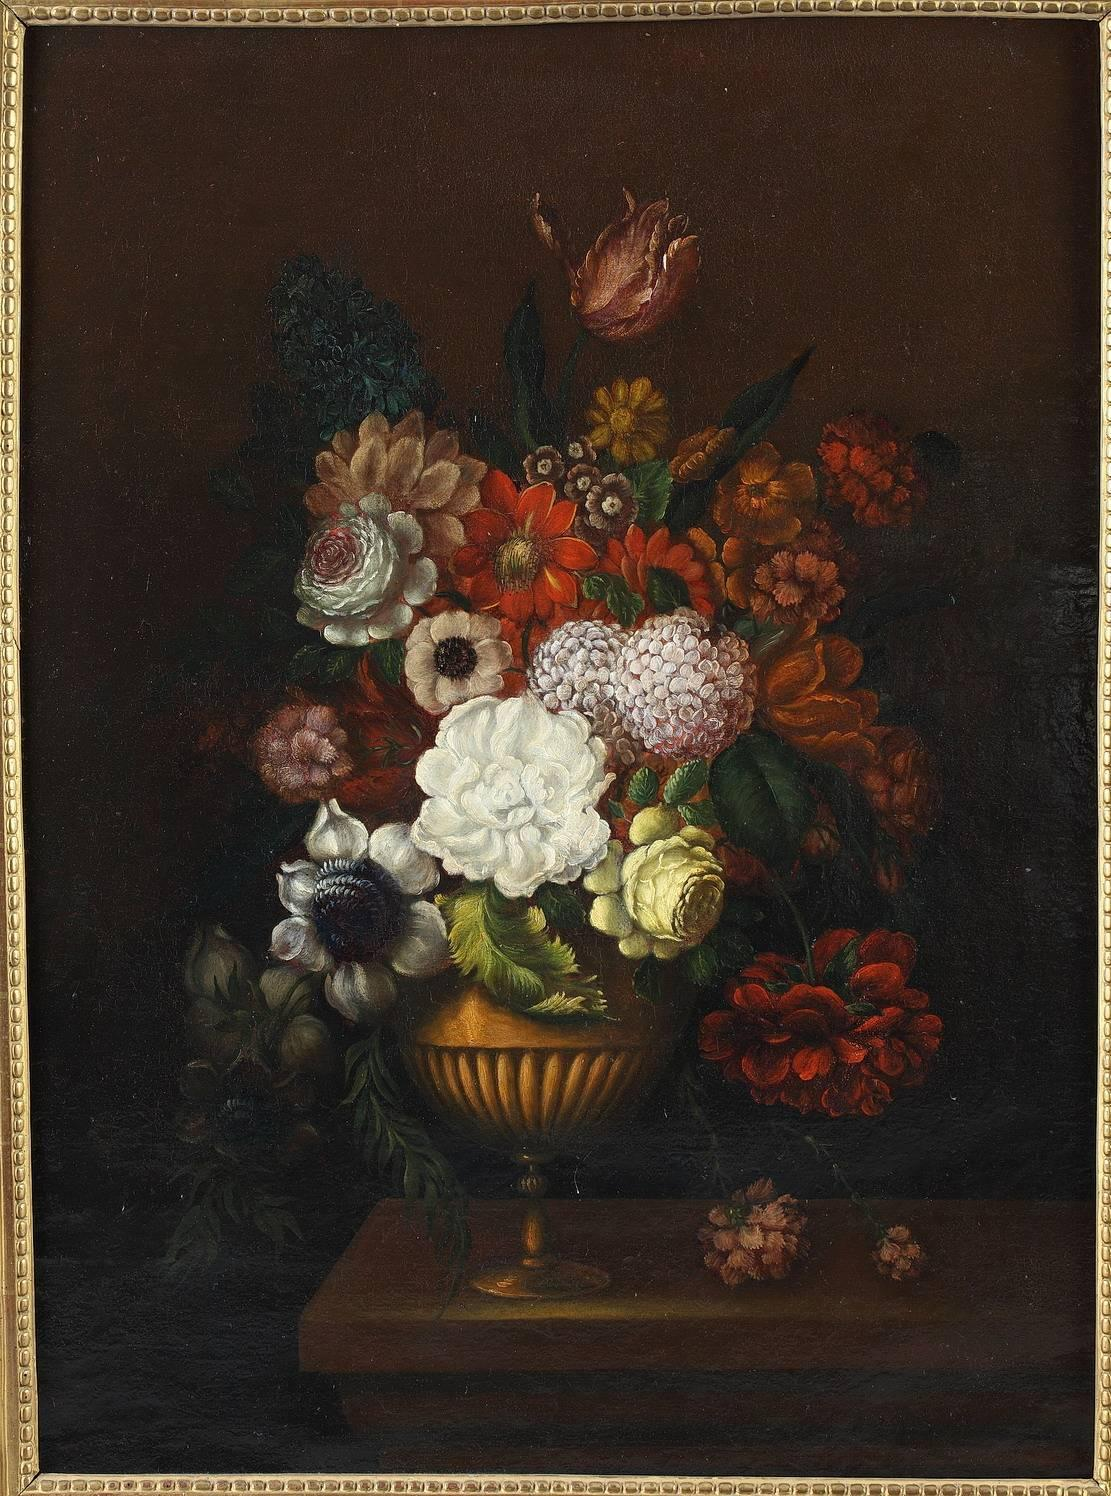 Pair of oil on canvas paintings flower bouquets from 19th century pair of oil on canvas paintings flower bouquets from 19th century for sale at 1stdibs izmirmasajfo